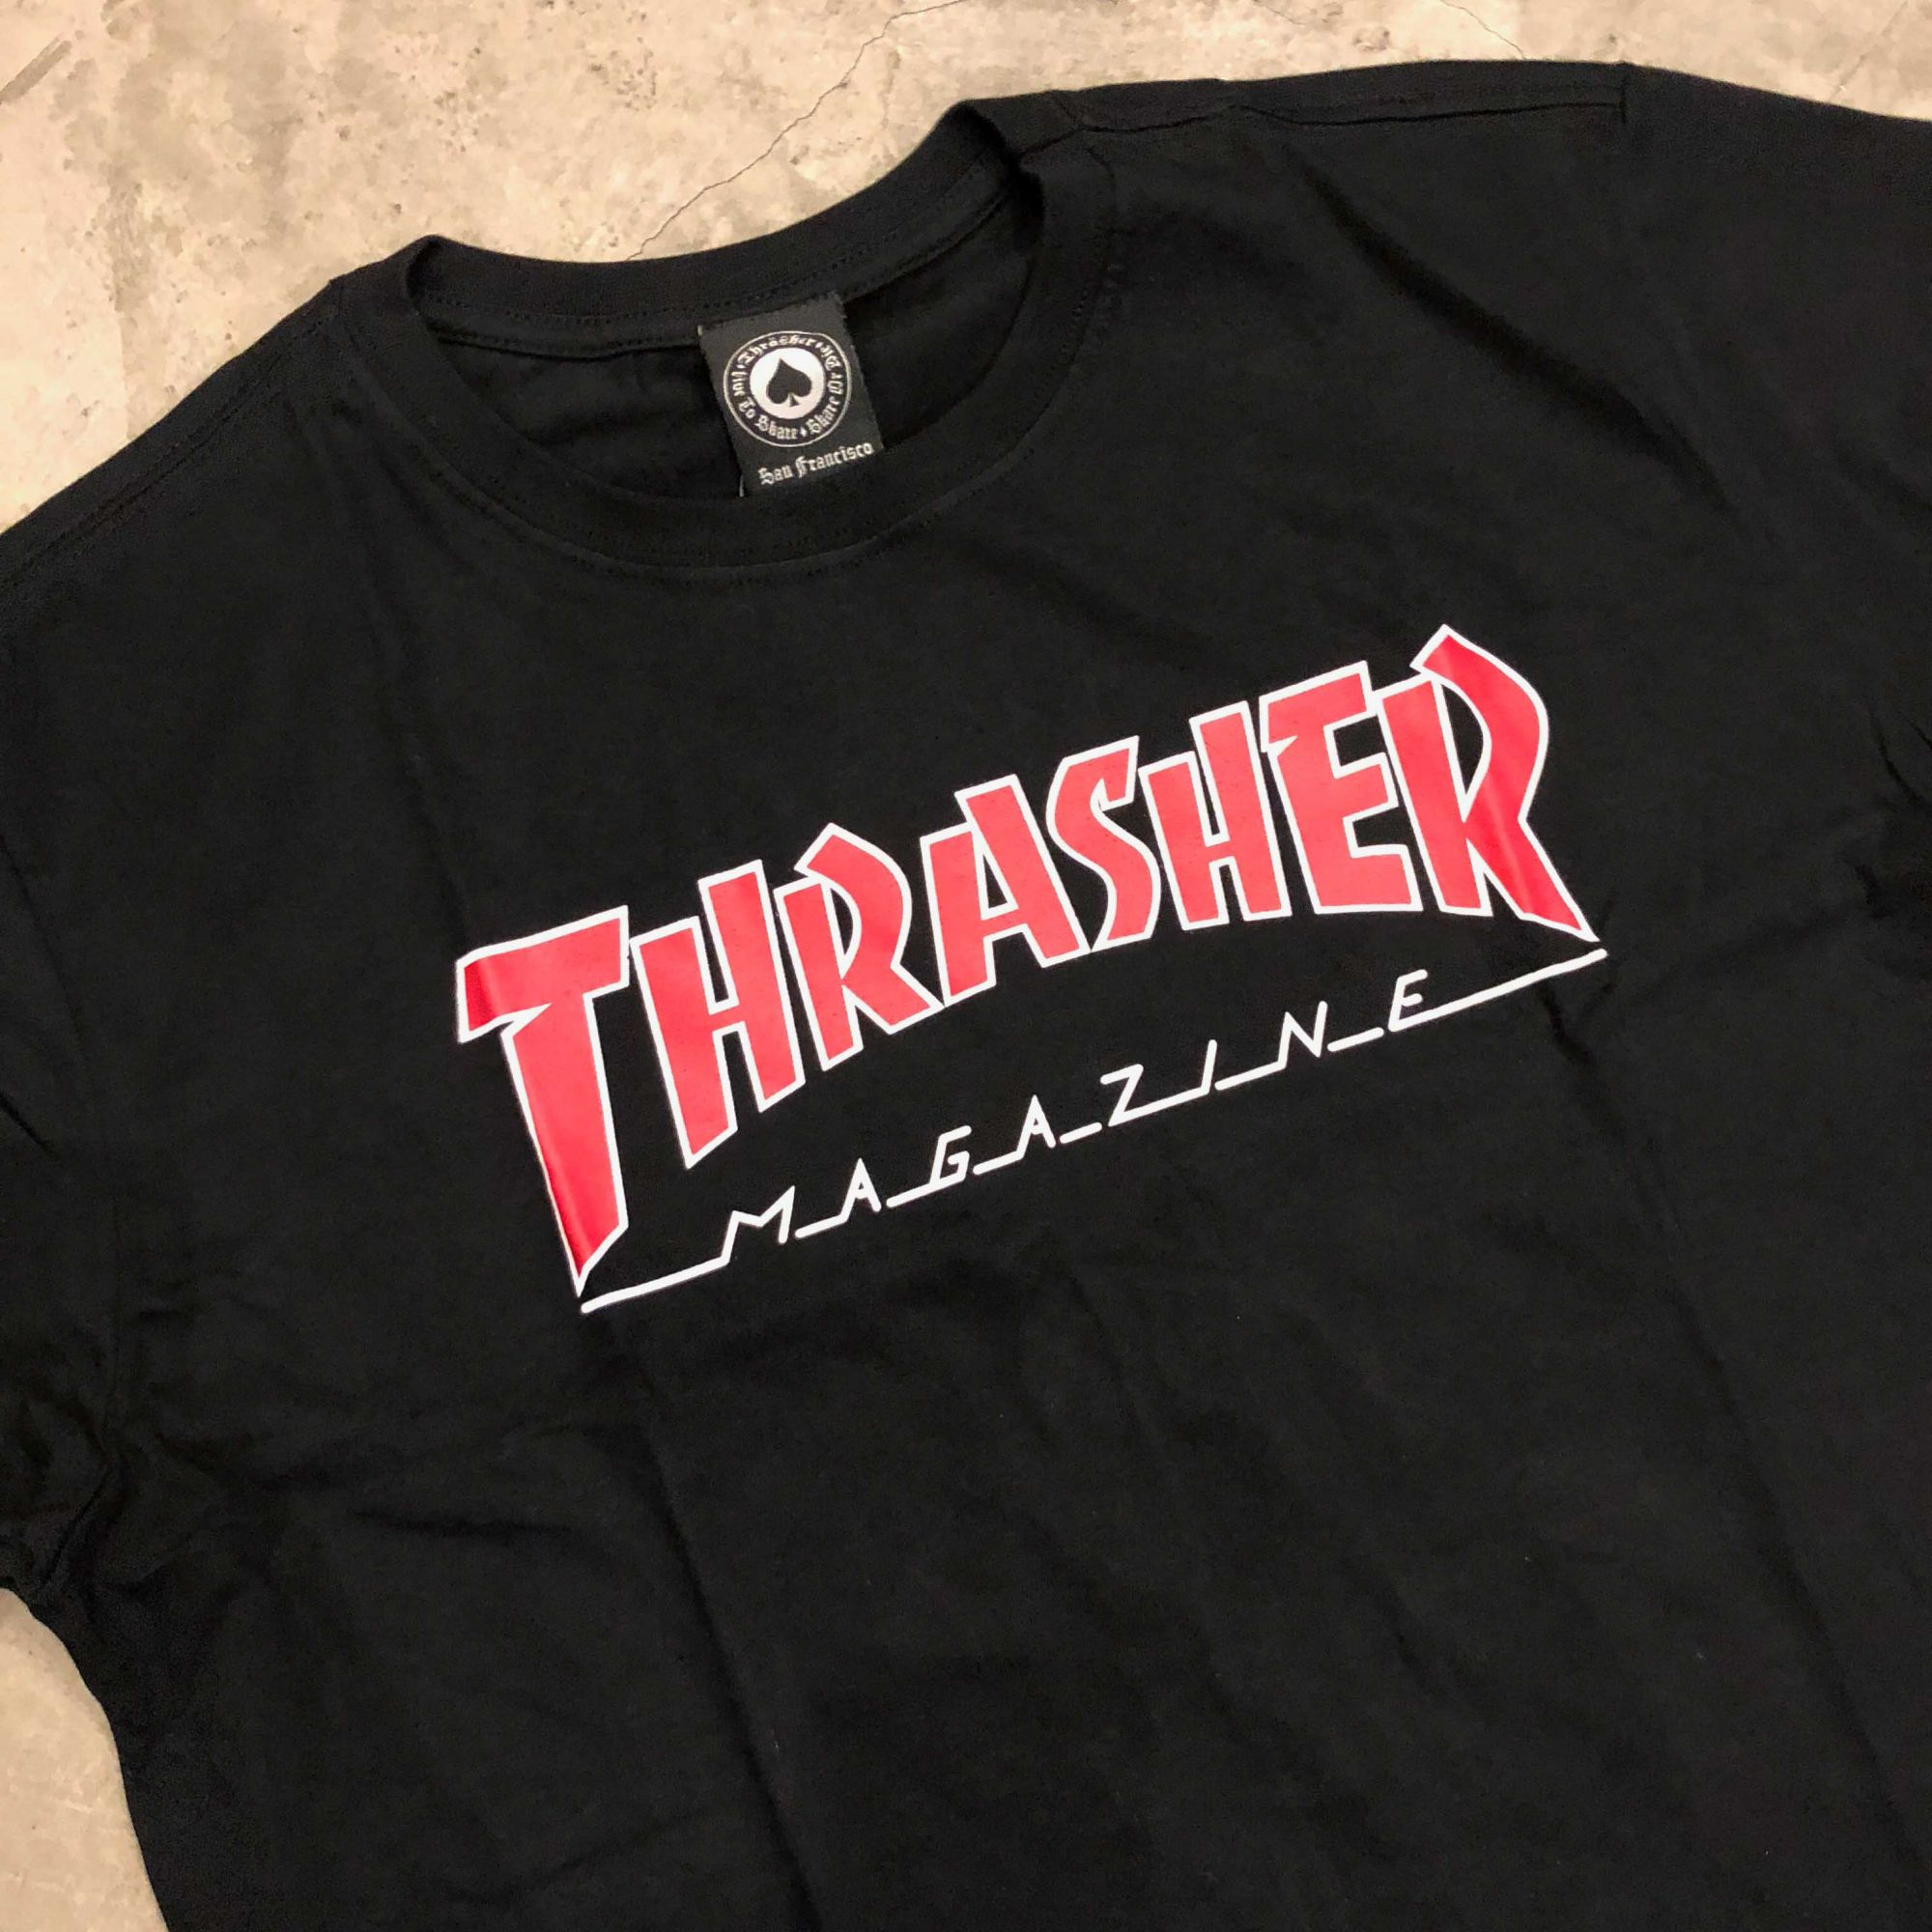 a77186570 Camiseta Thrasher